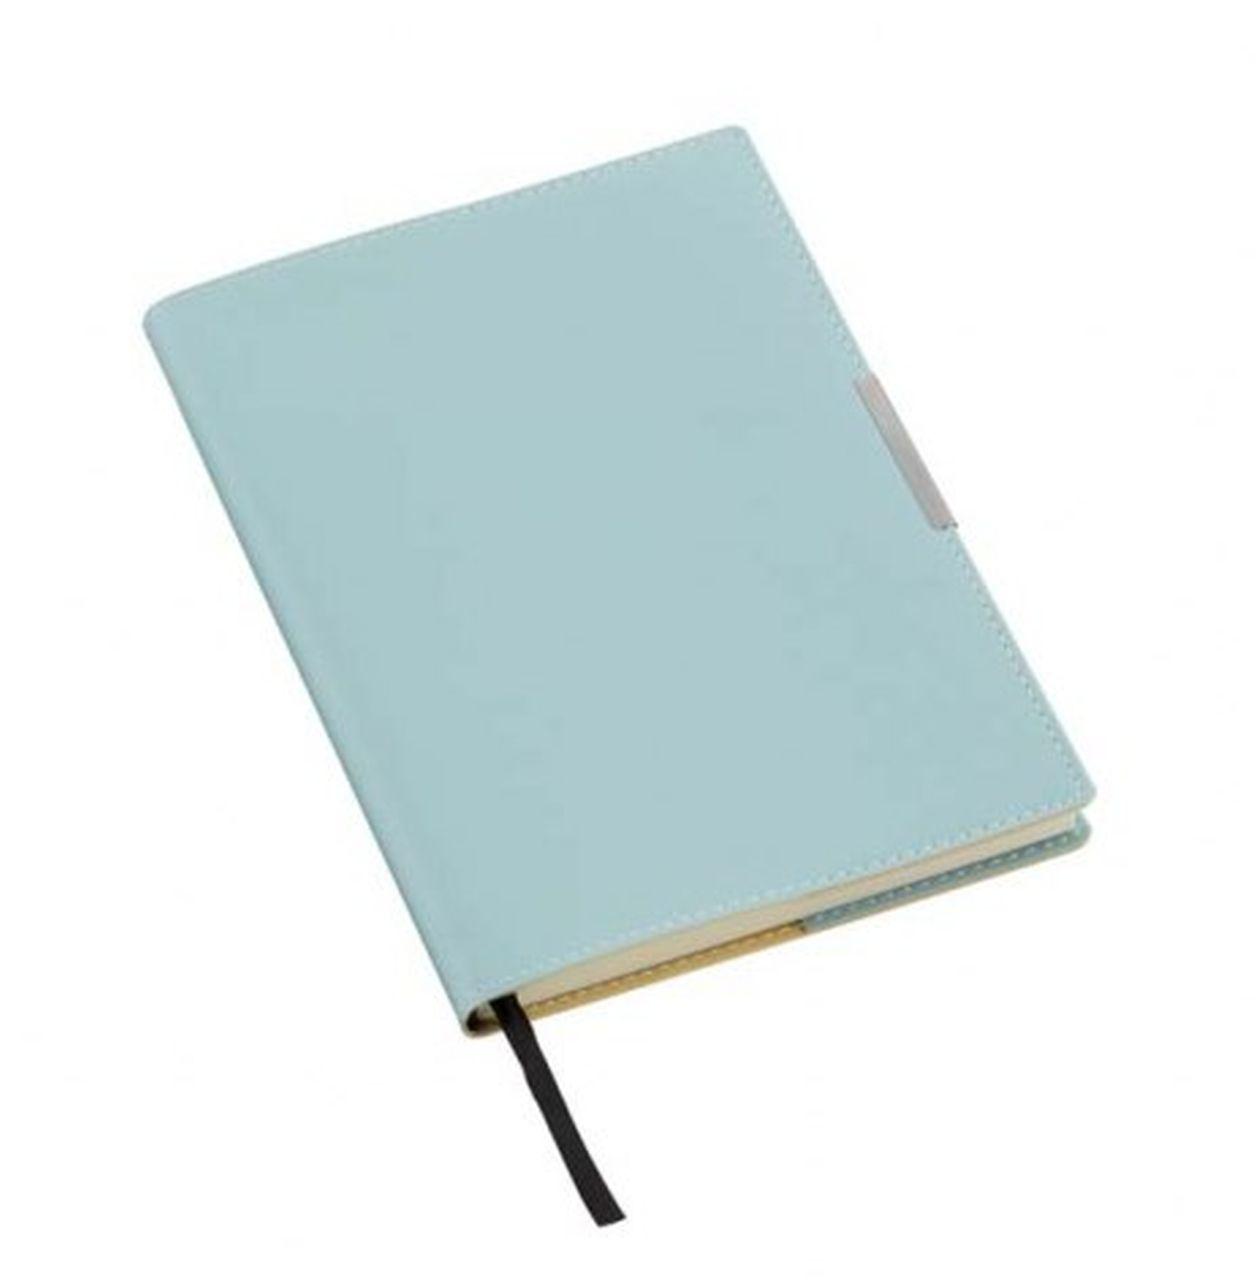 Notebook azzurro placca argento